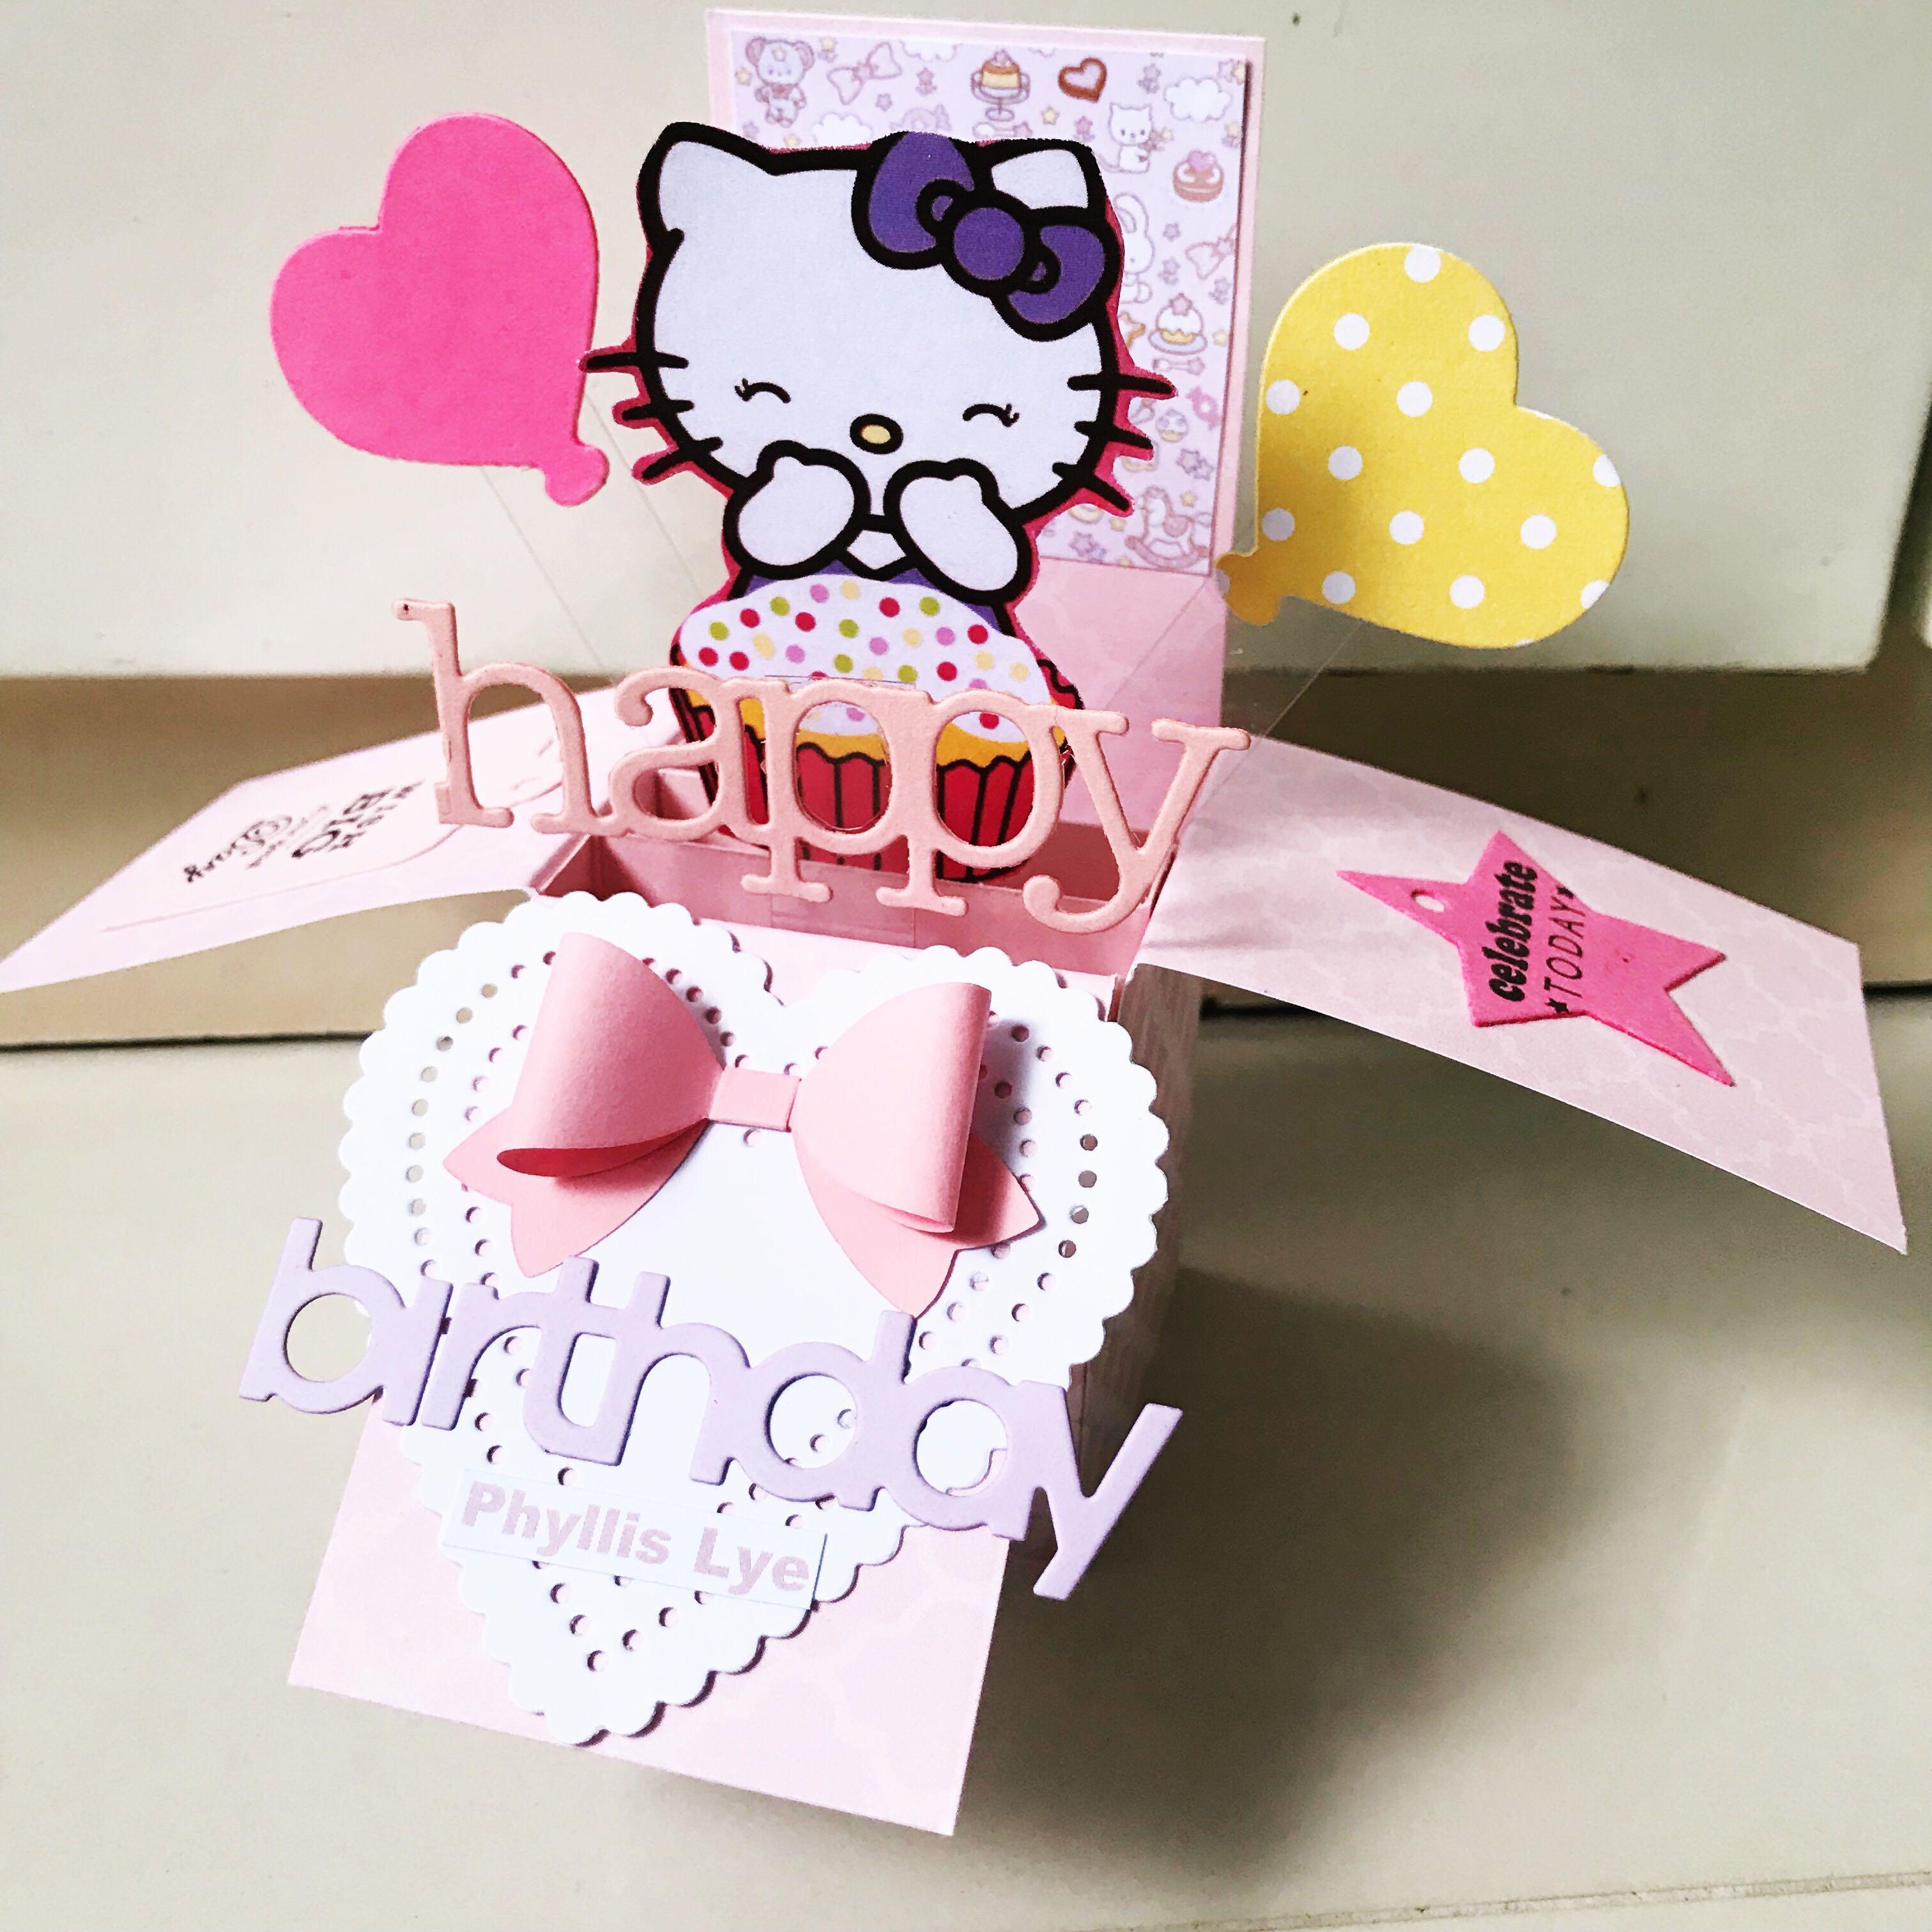 Incredible Happy Birthday Hello Kitty Handmade Pop Up Card Design Craft Funny Birthday Cards Online Alyptdamsfinfo